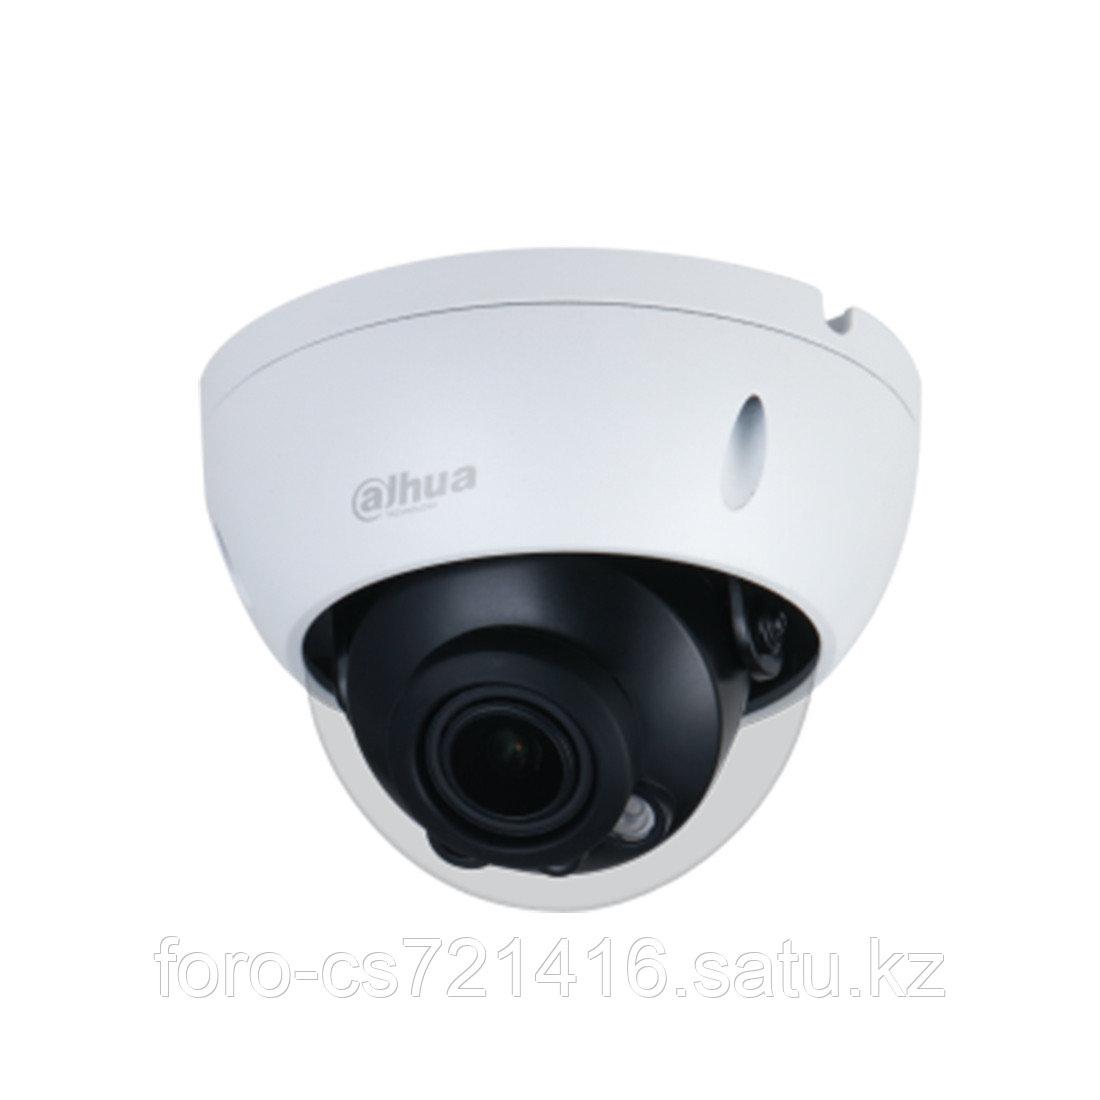 Купольная видеокамера Dahua DH-IPC-HDBW2231RP-ZAS-S2